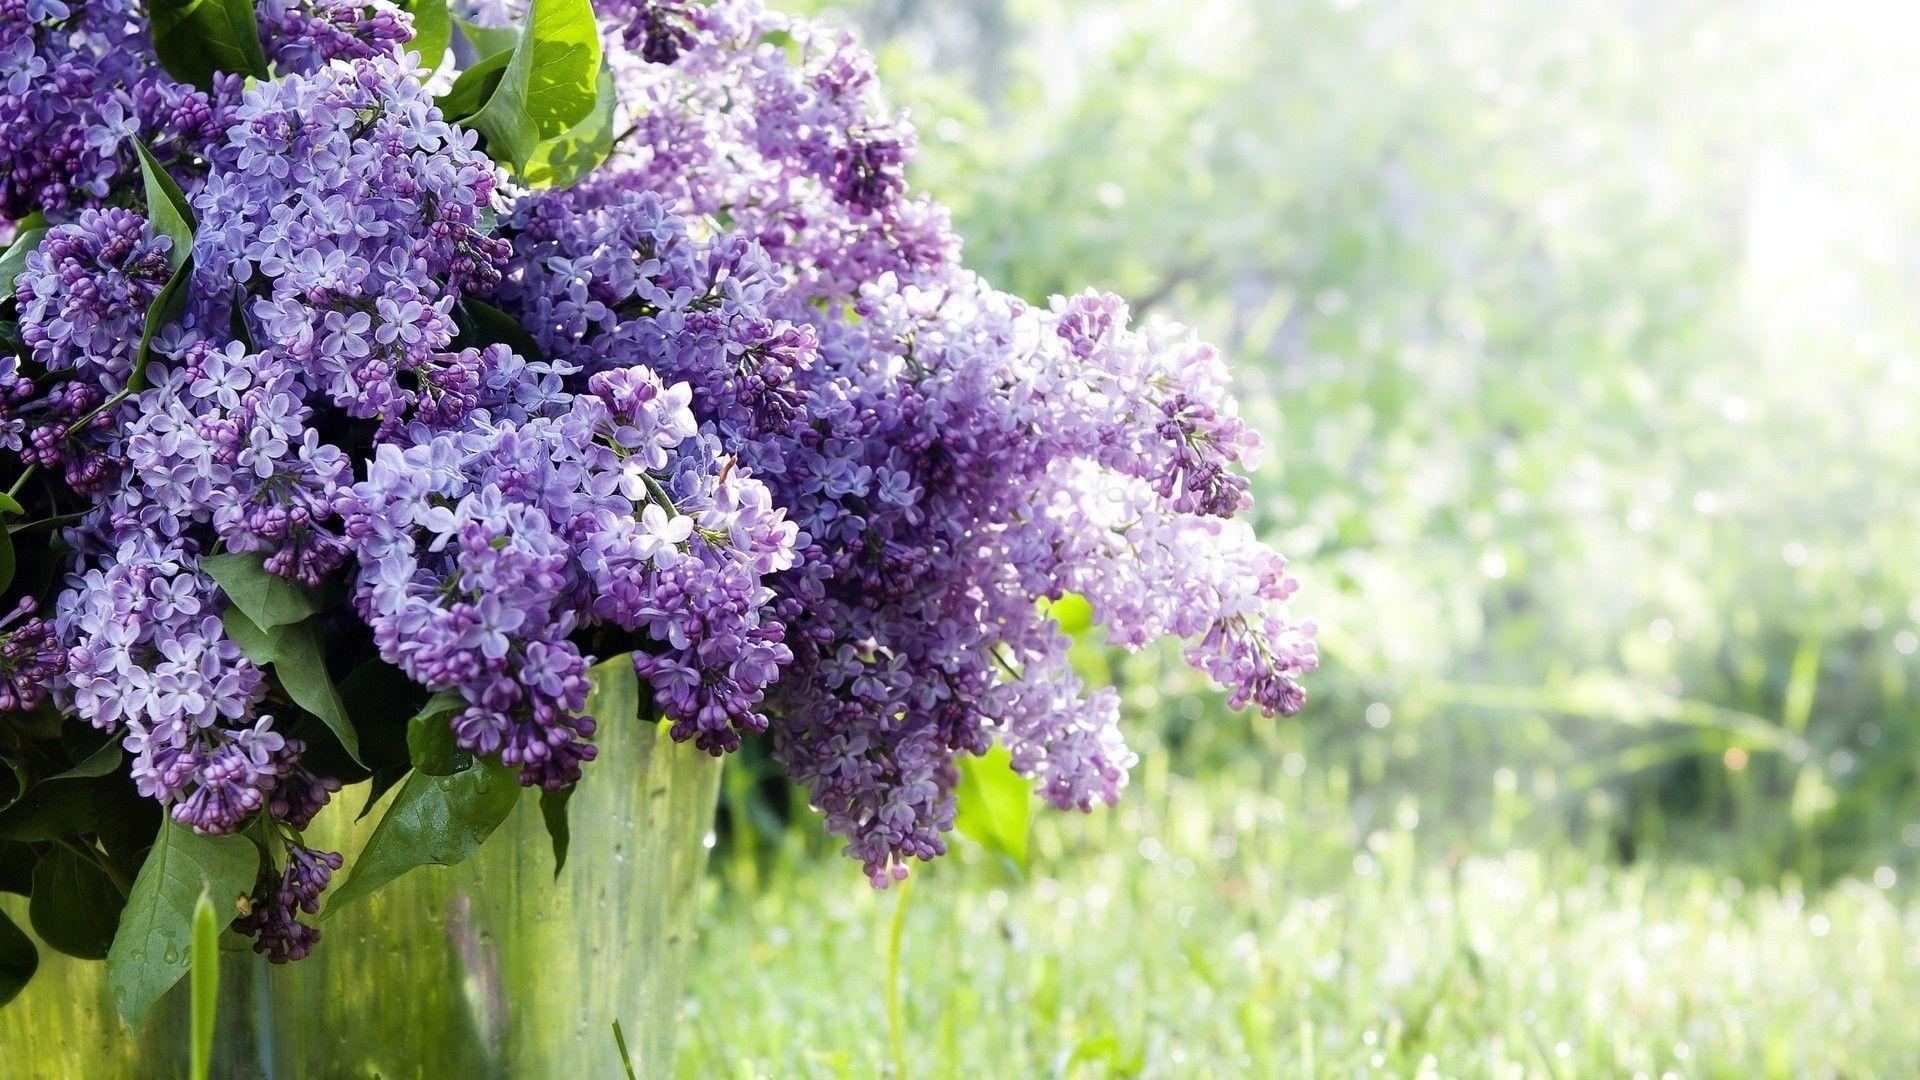 Purple Acacia Flower Wallpaper Flower Wallpaper Purple Trees Flowers